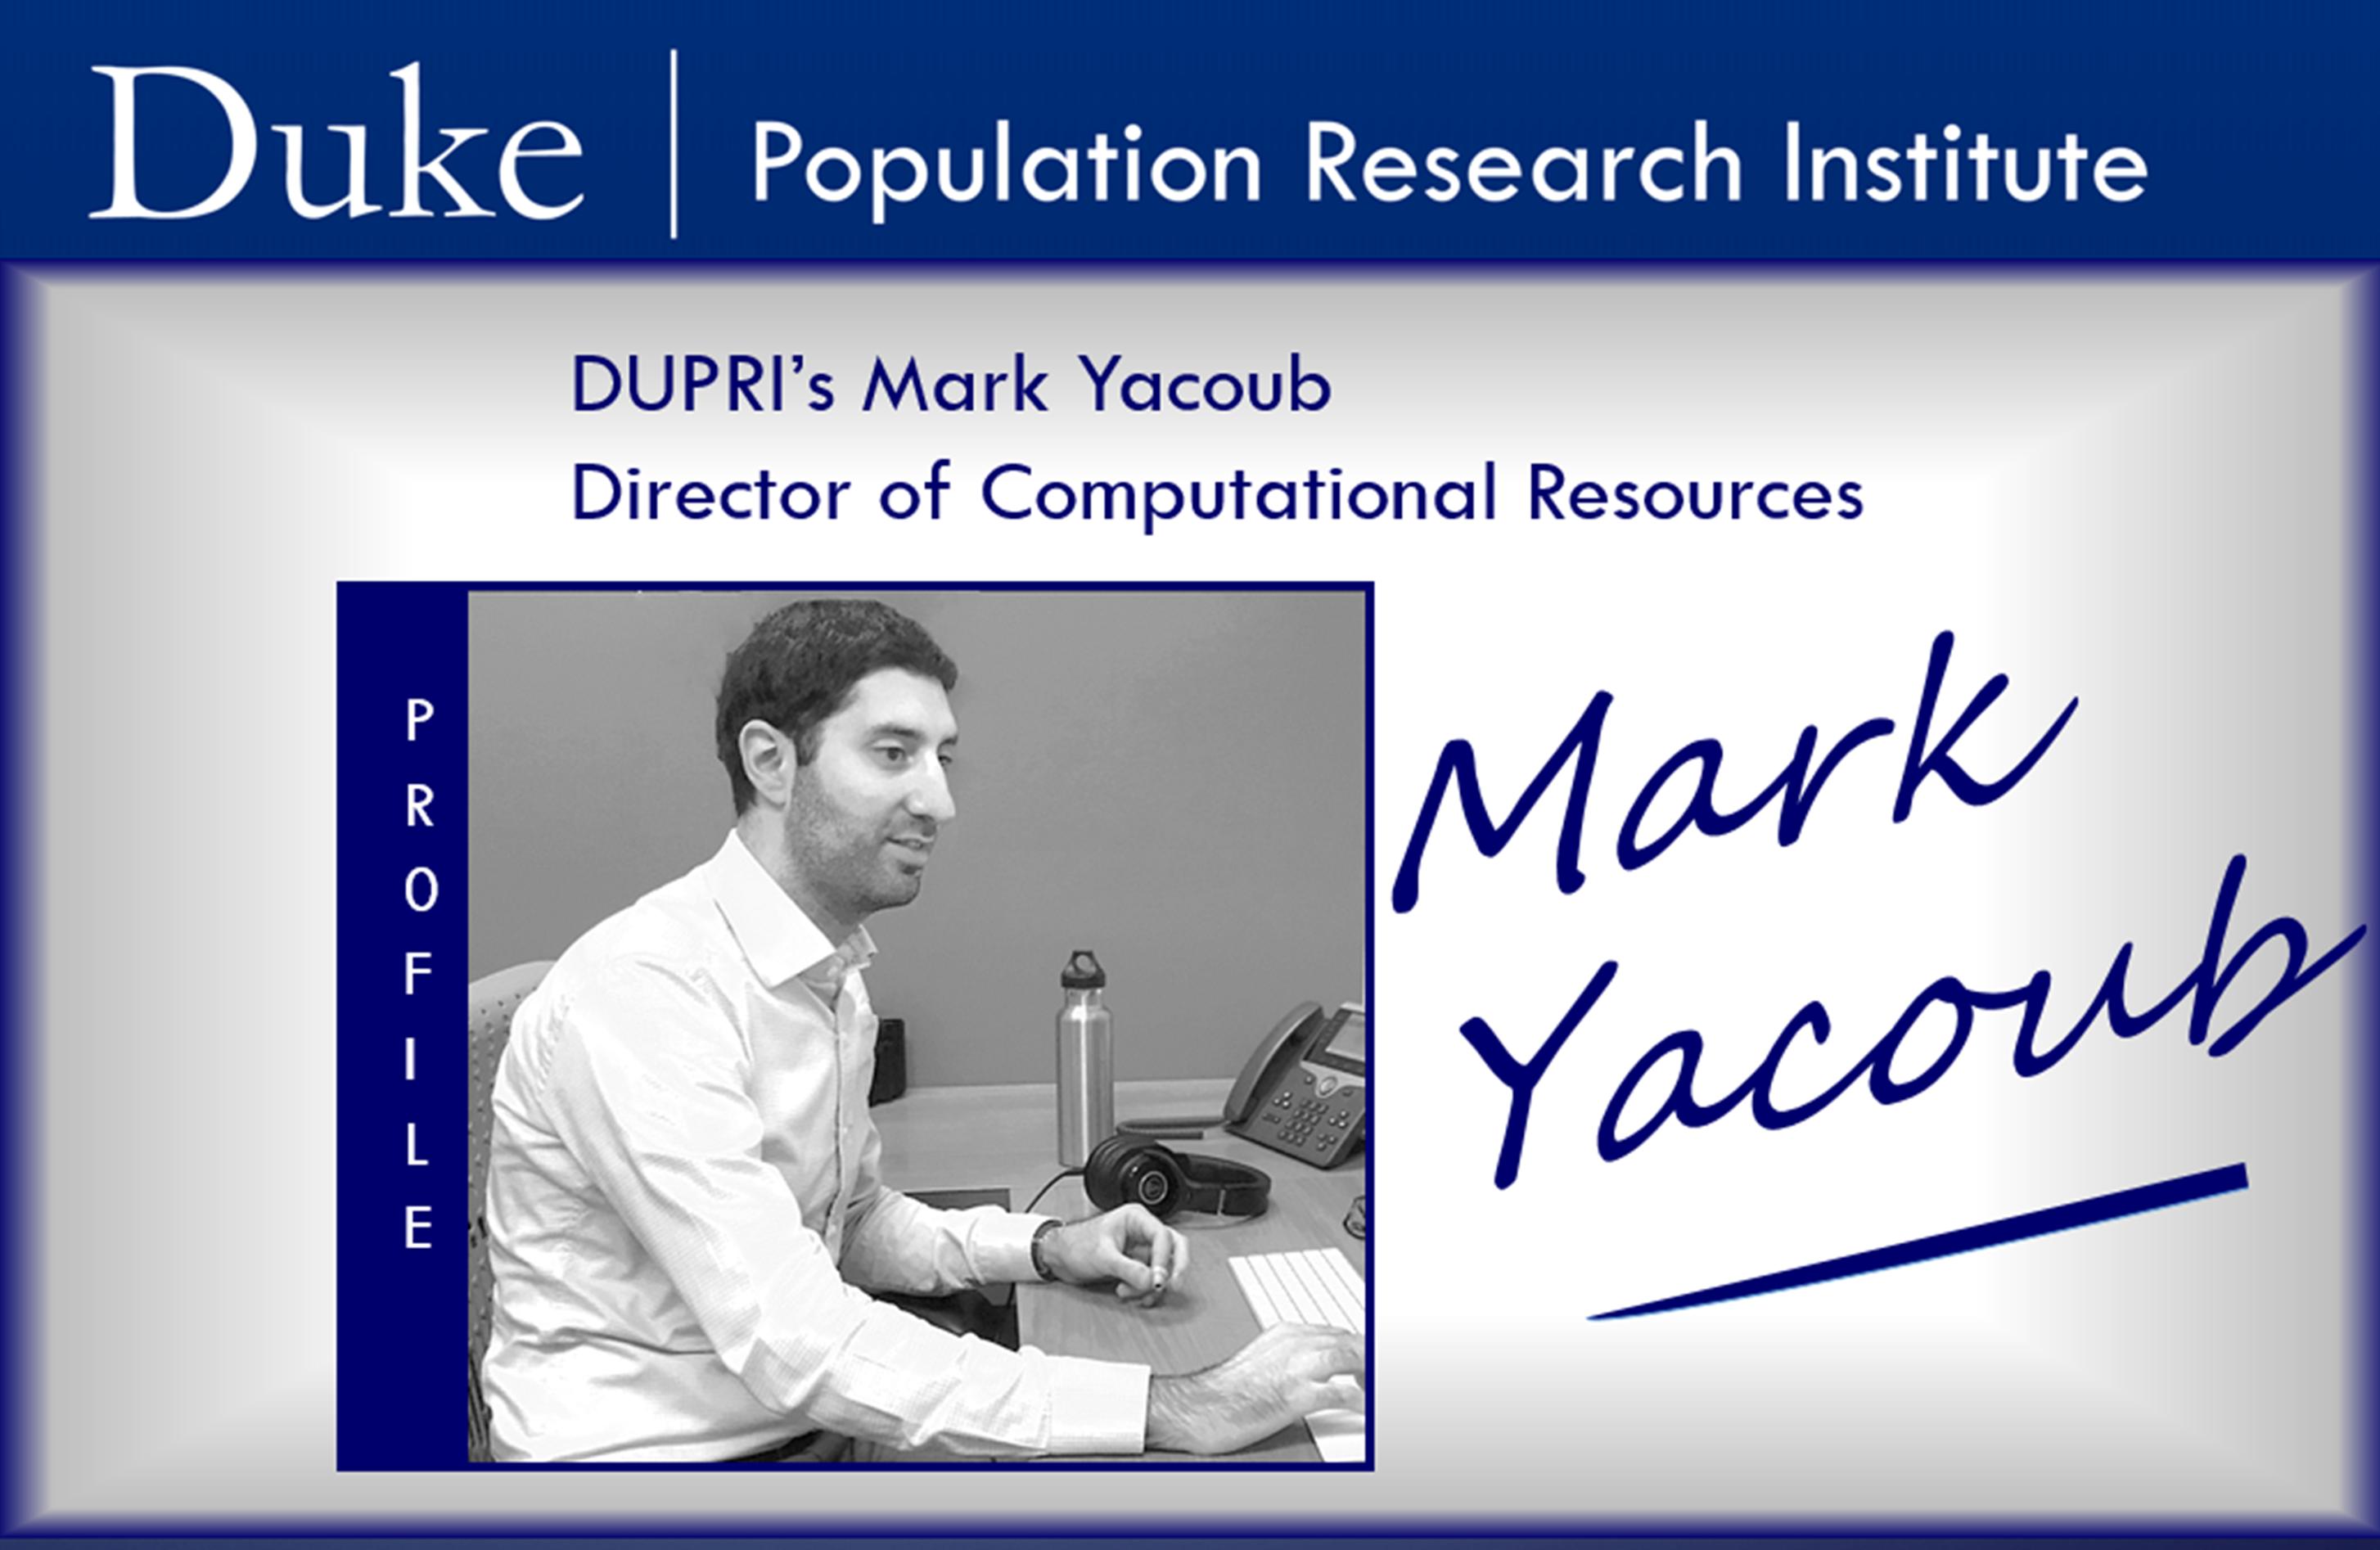 Meet DUPRI's Director of Computational Resources - Mark Yacoub